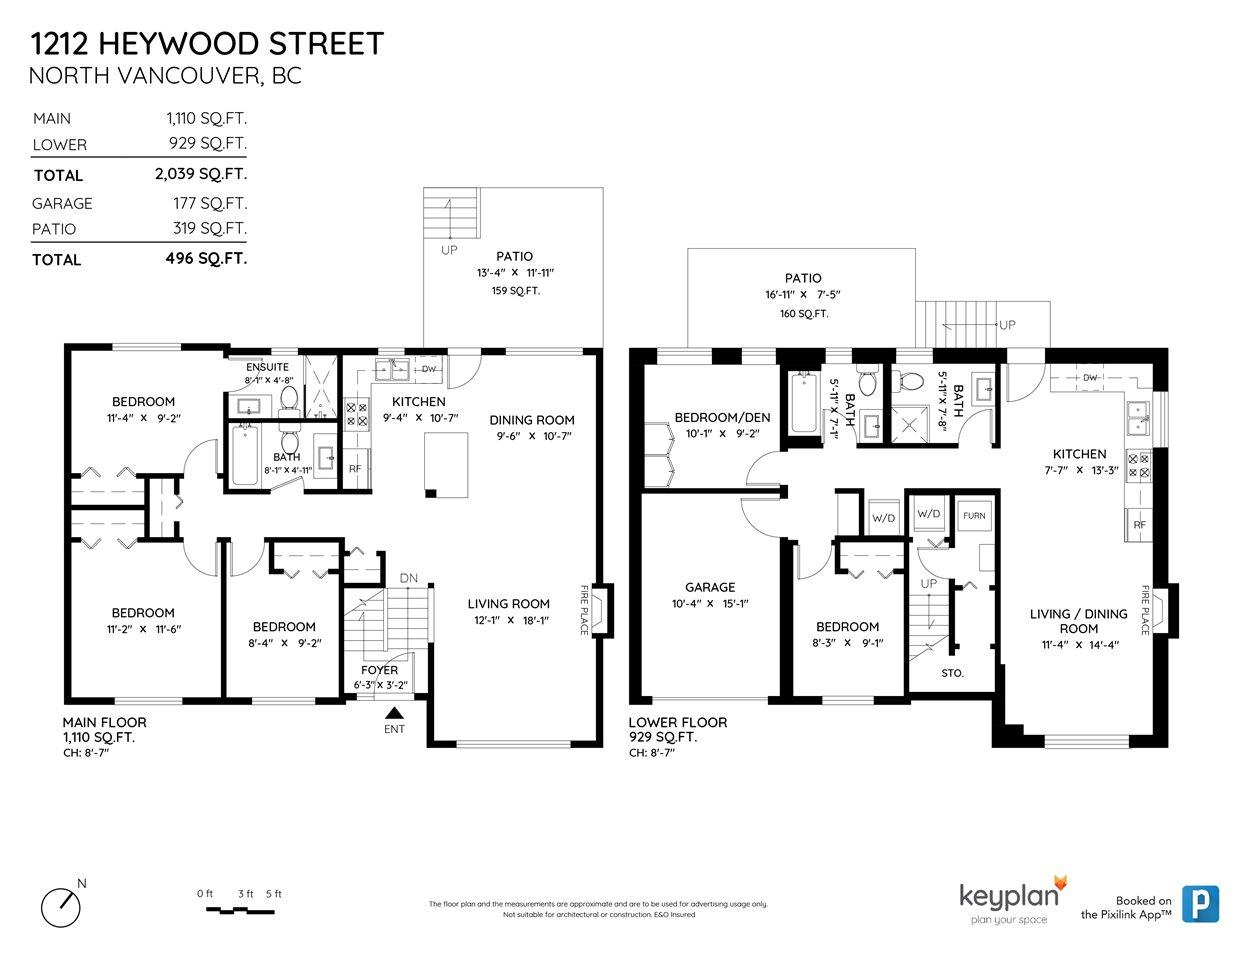 Listing Image of 1212 HEYWOOD STREET